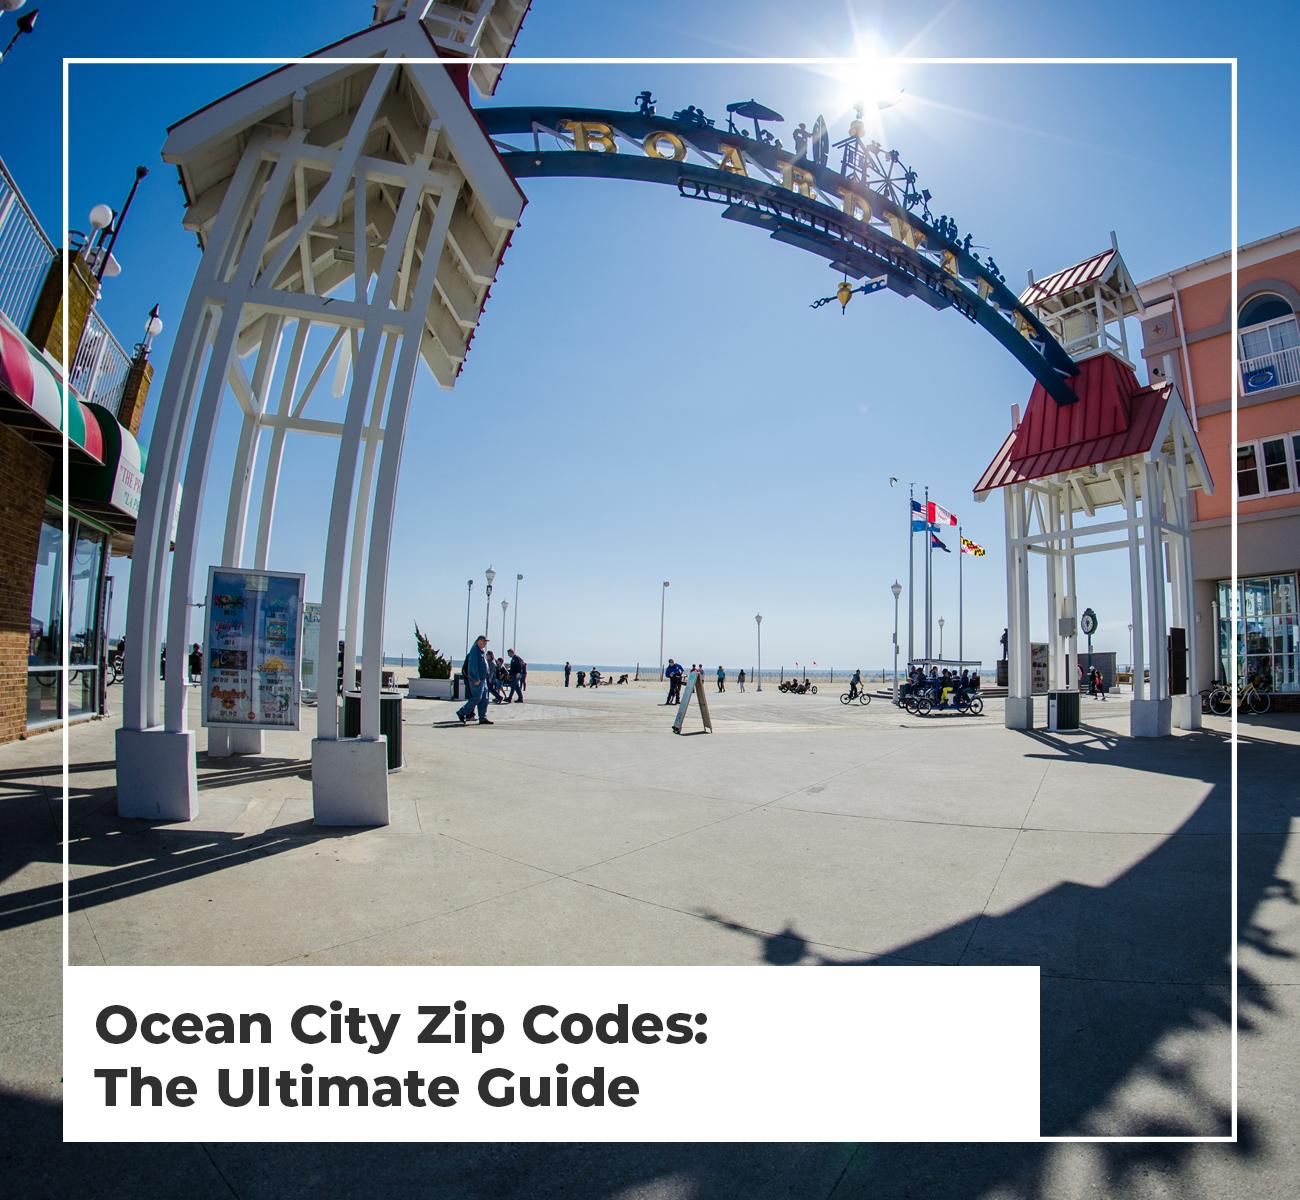 Ocean City Zip Codes Guide